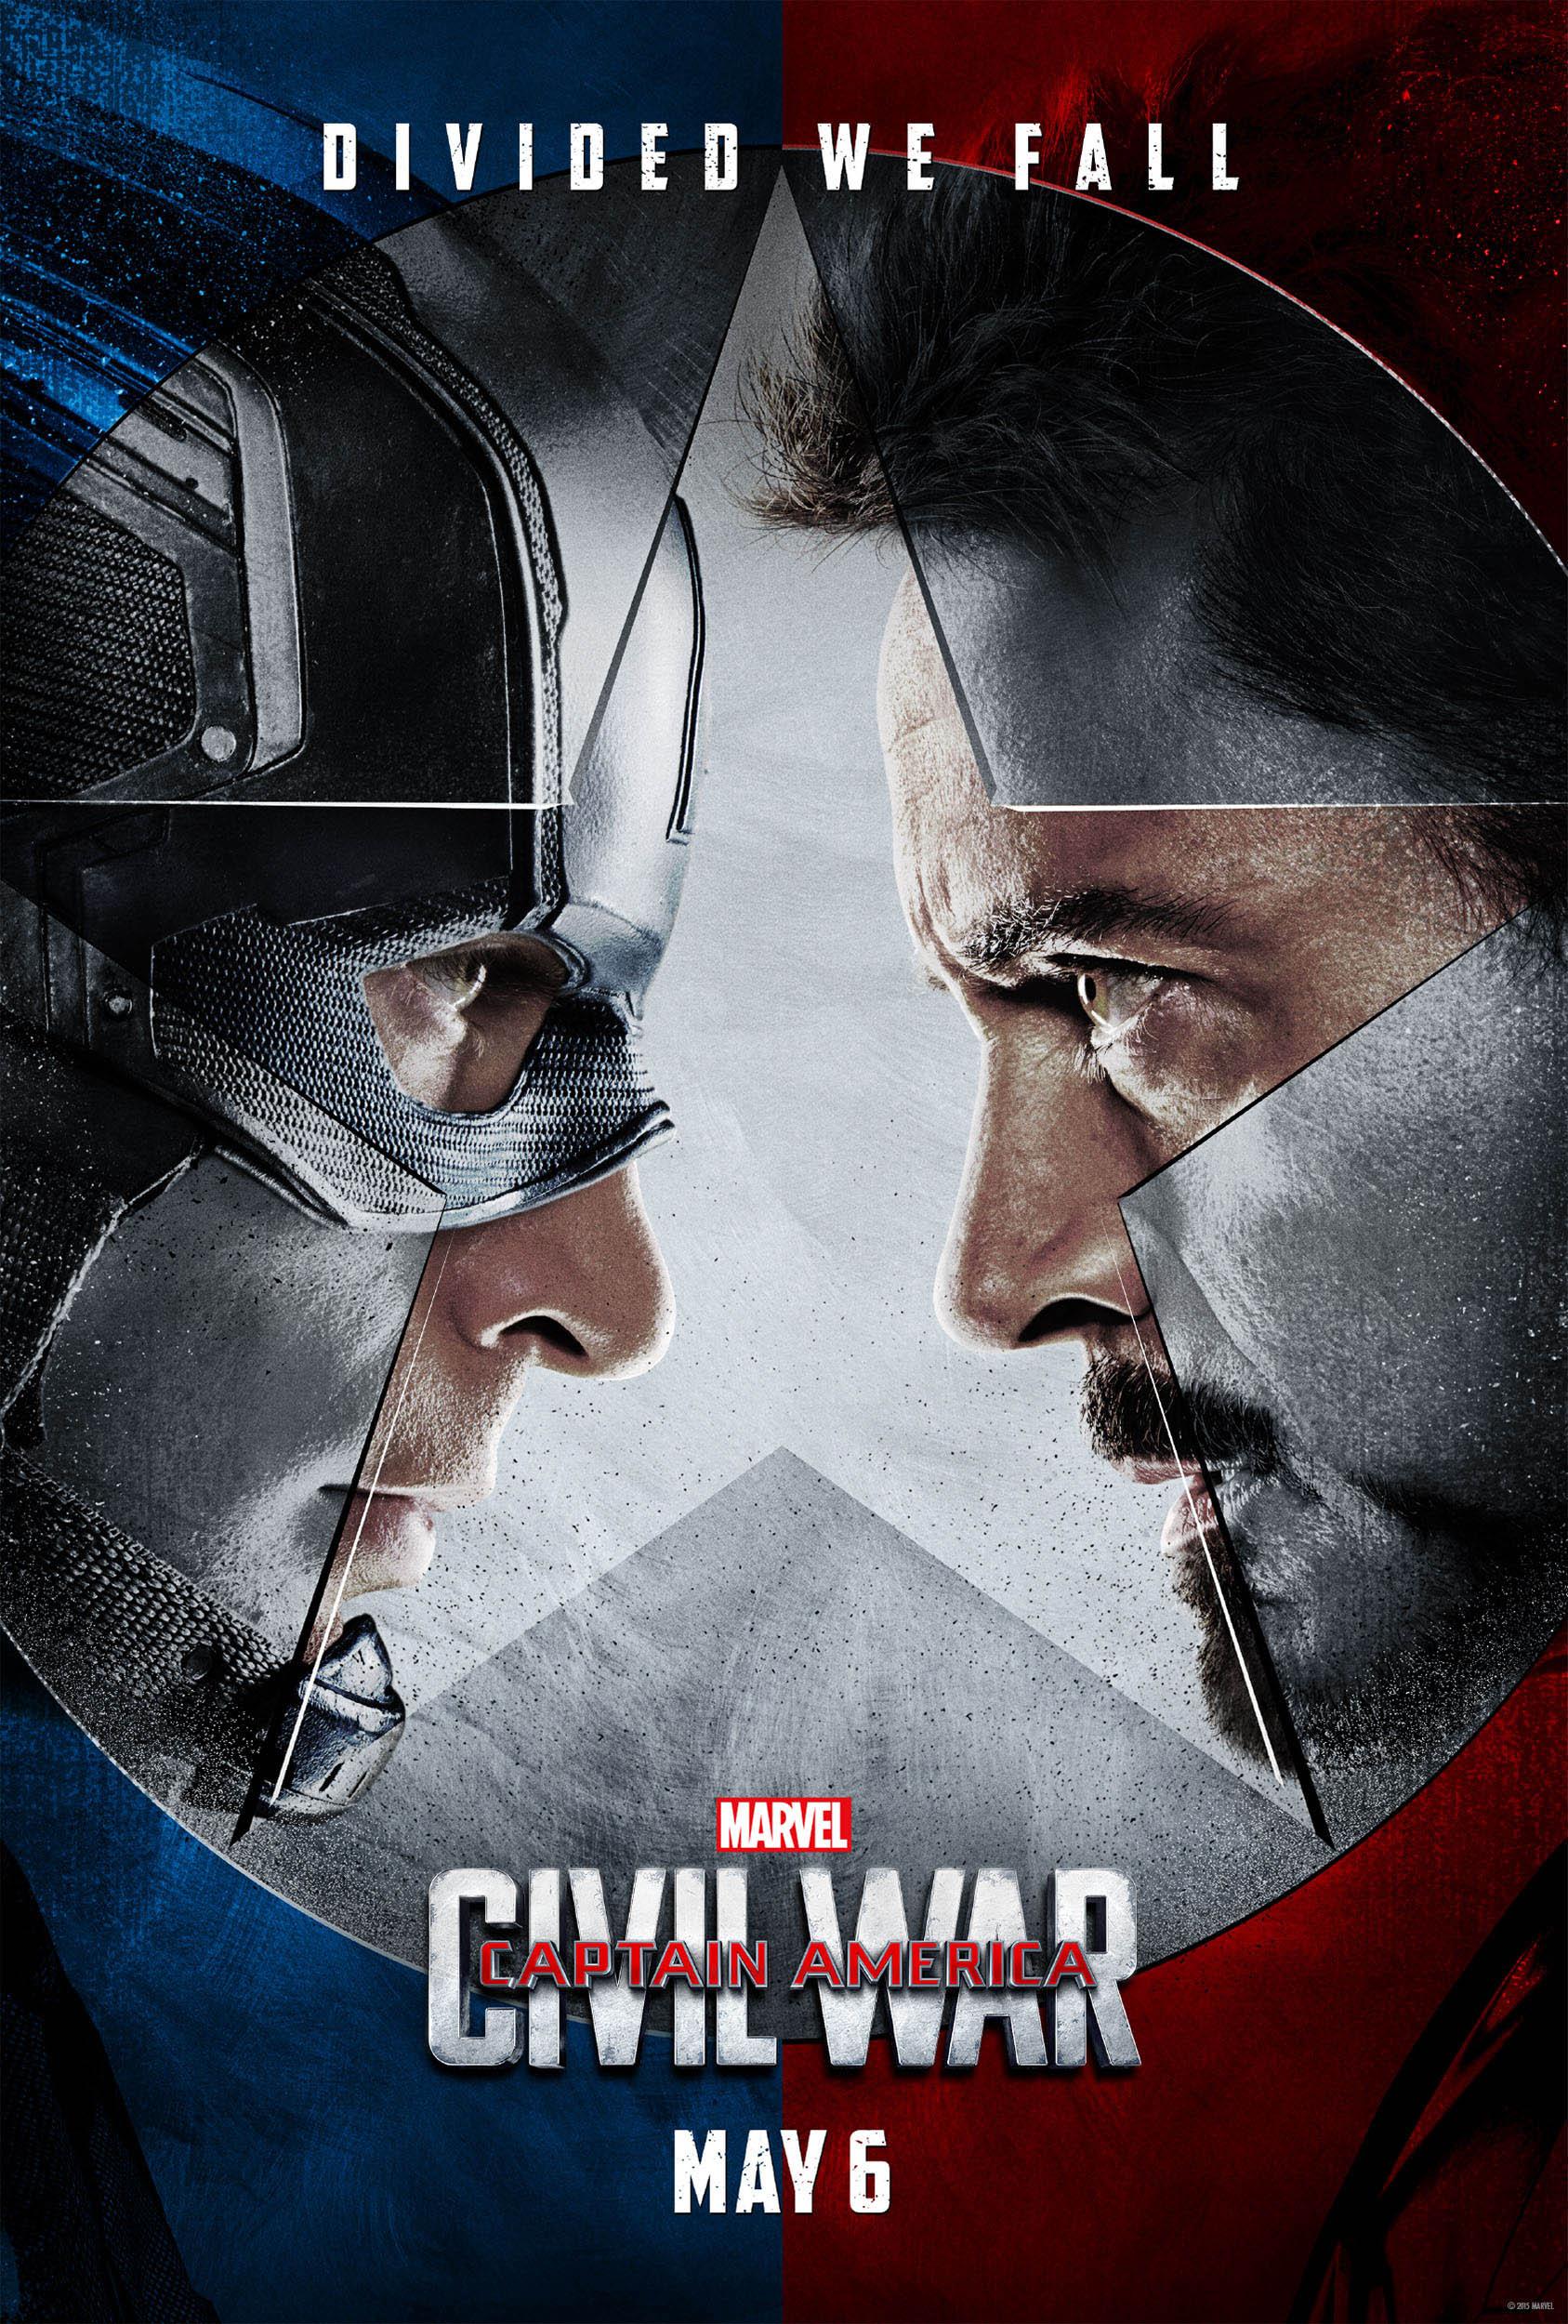 captain america civil war poster1 - انتشار اولین تریلر و پوسترهای رسمی «جنگ داخلی» مارول